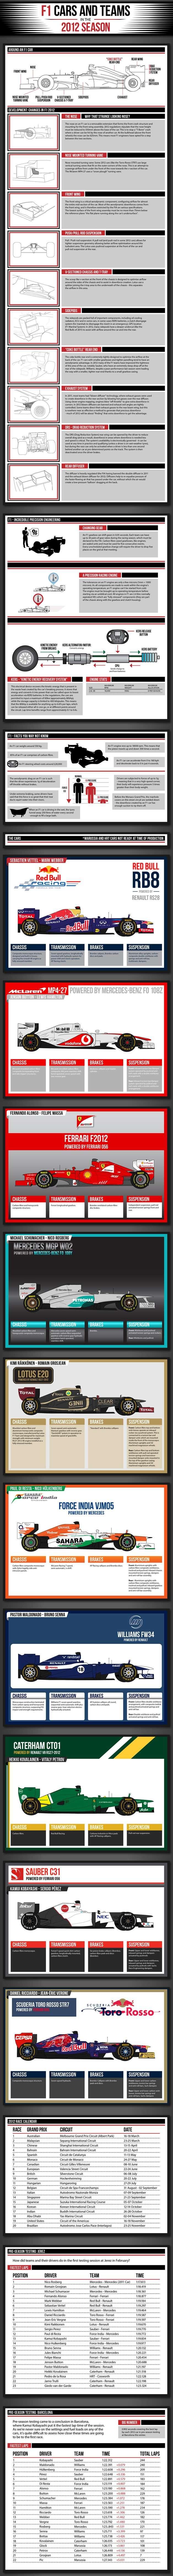 2 unidades Patch fórmula 1 f1 Renault Sport nº 723